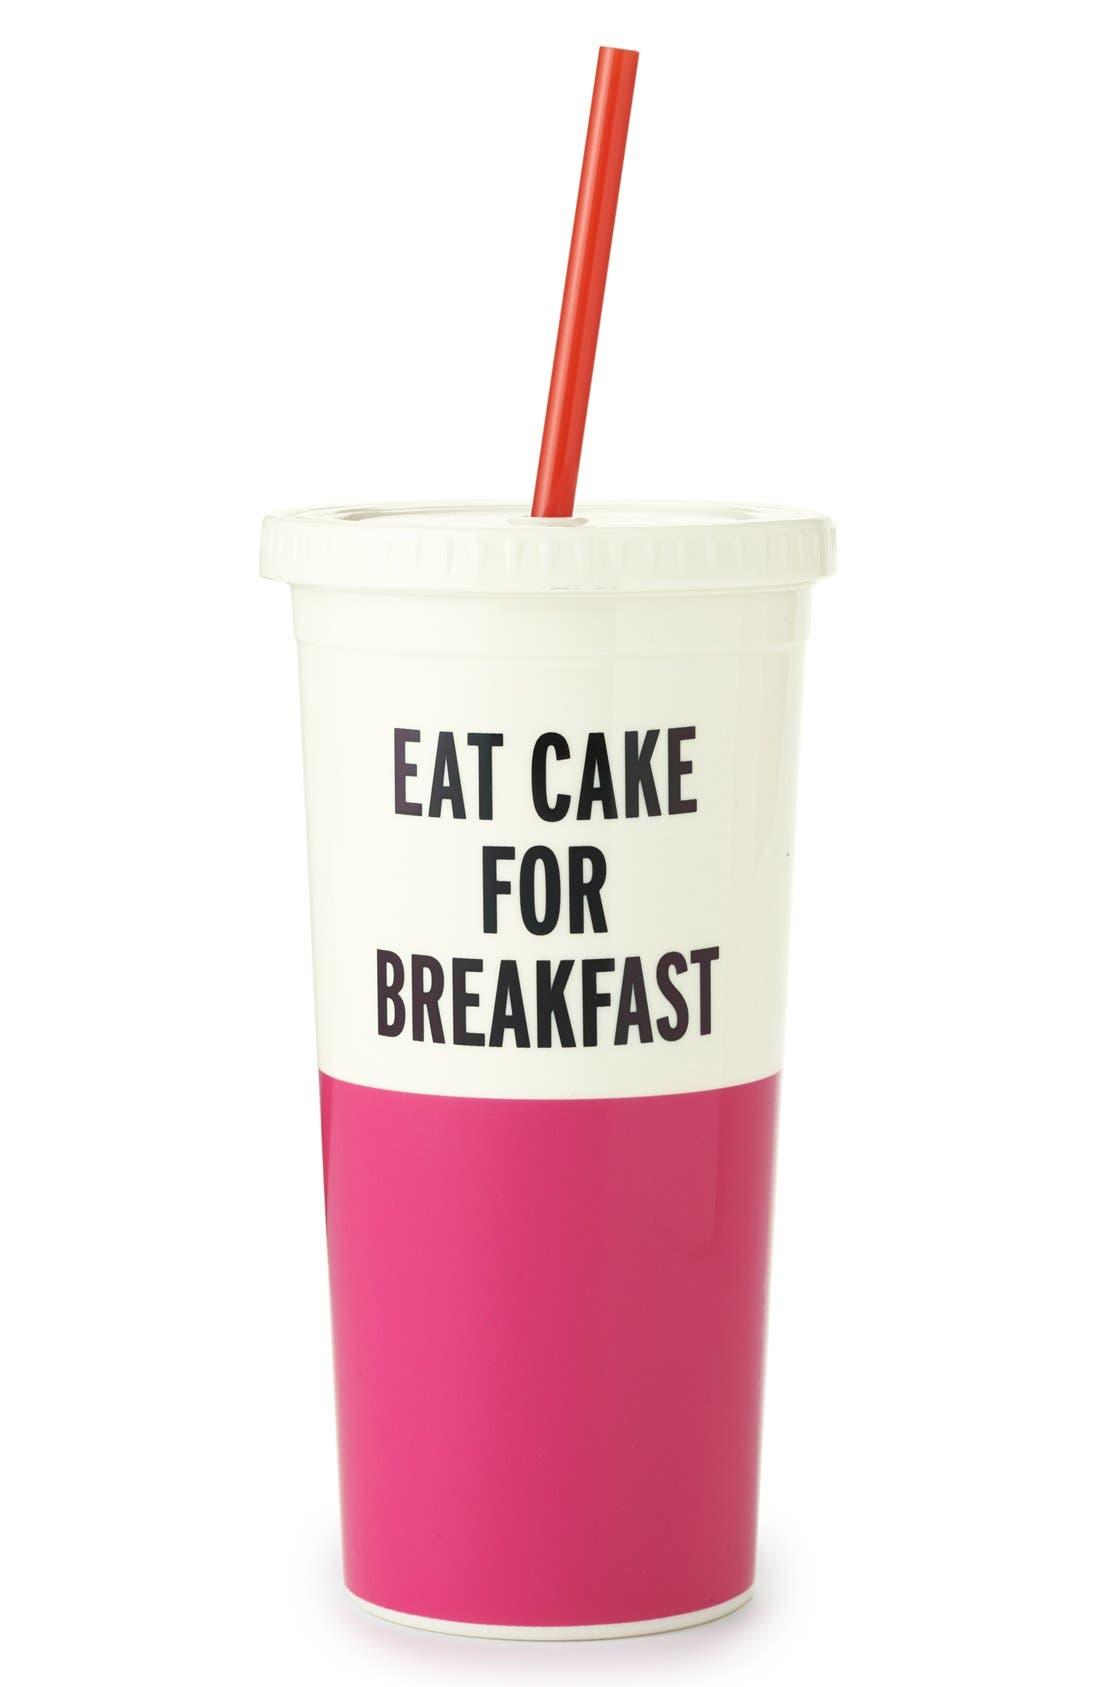 Alternate Image 1 Selected - kate spade new york 'eat cake for breakfast' insulated tumbler